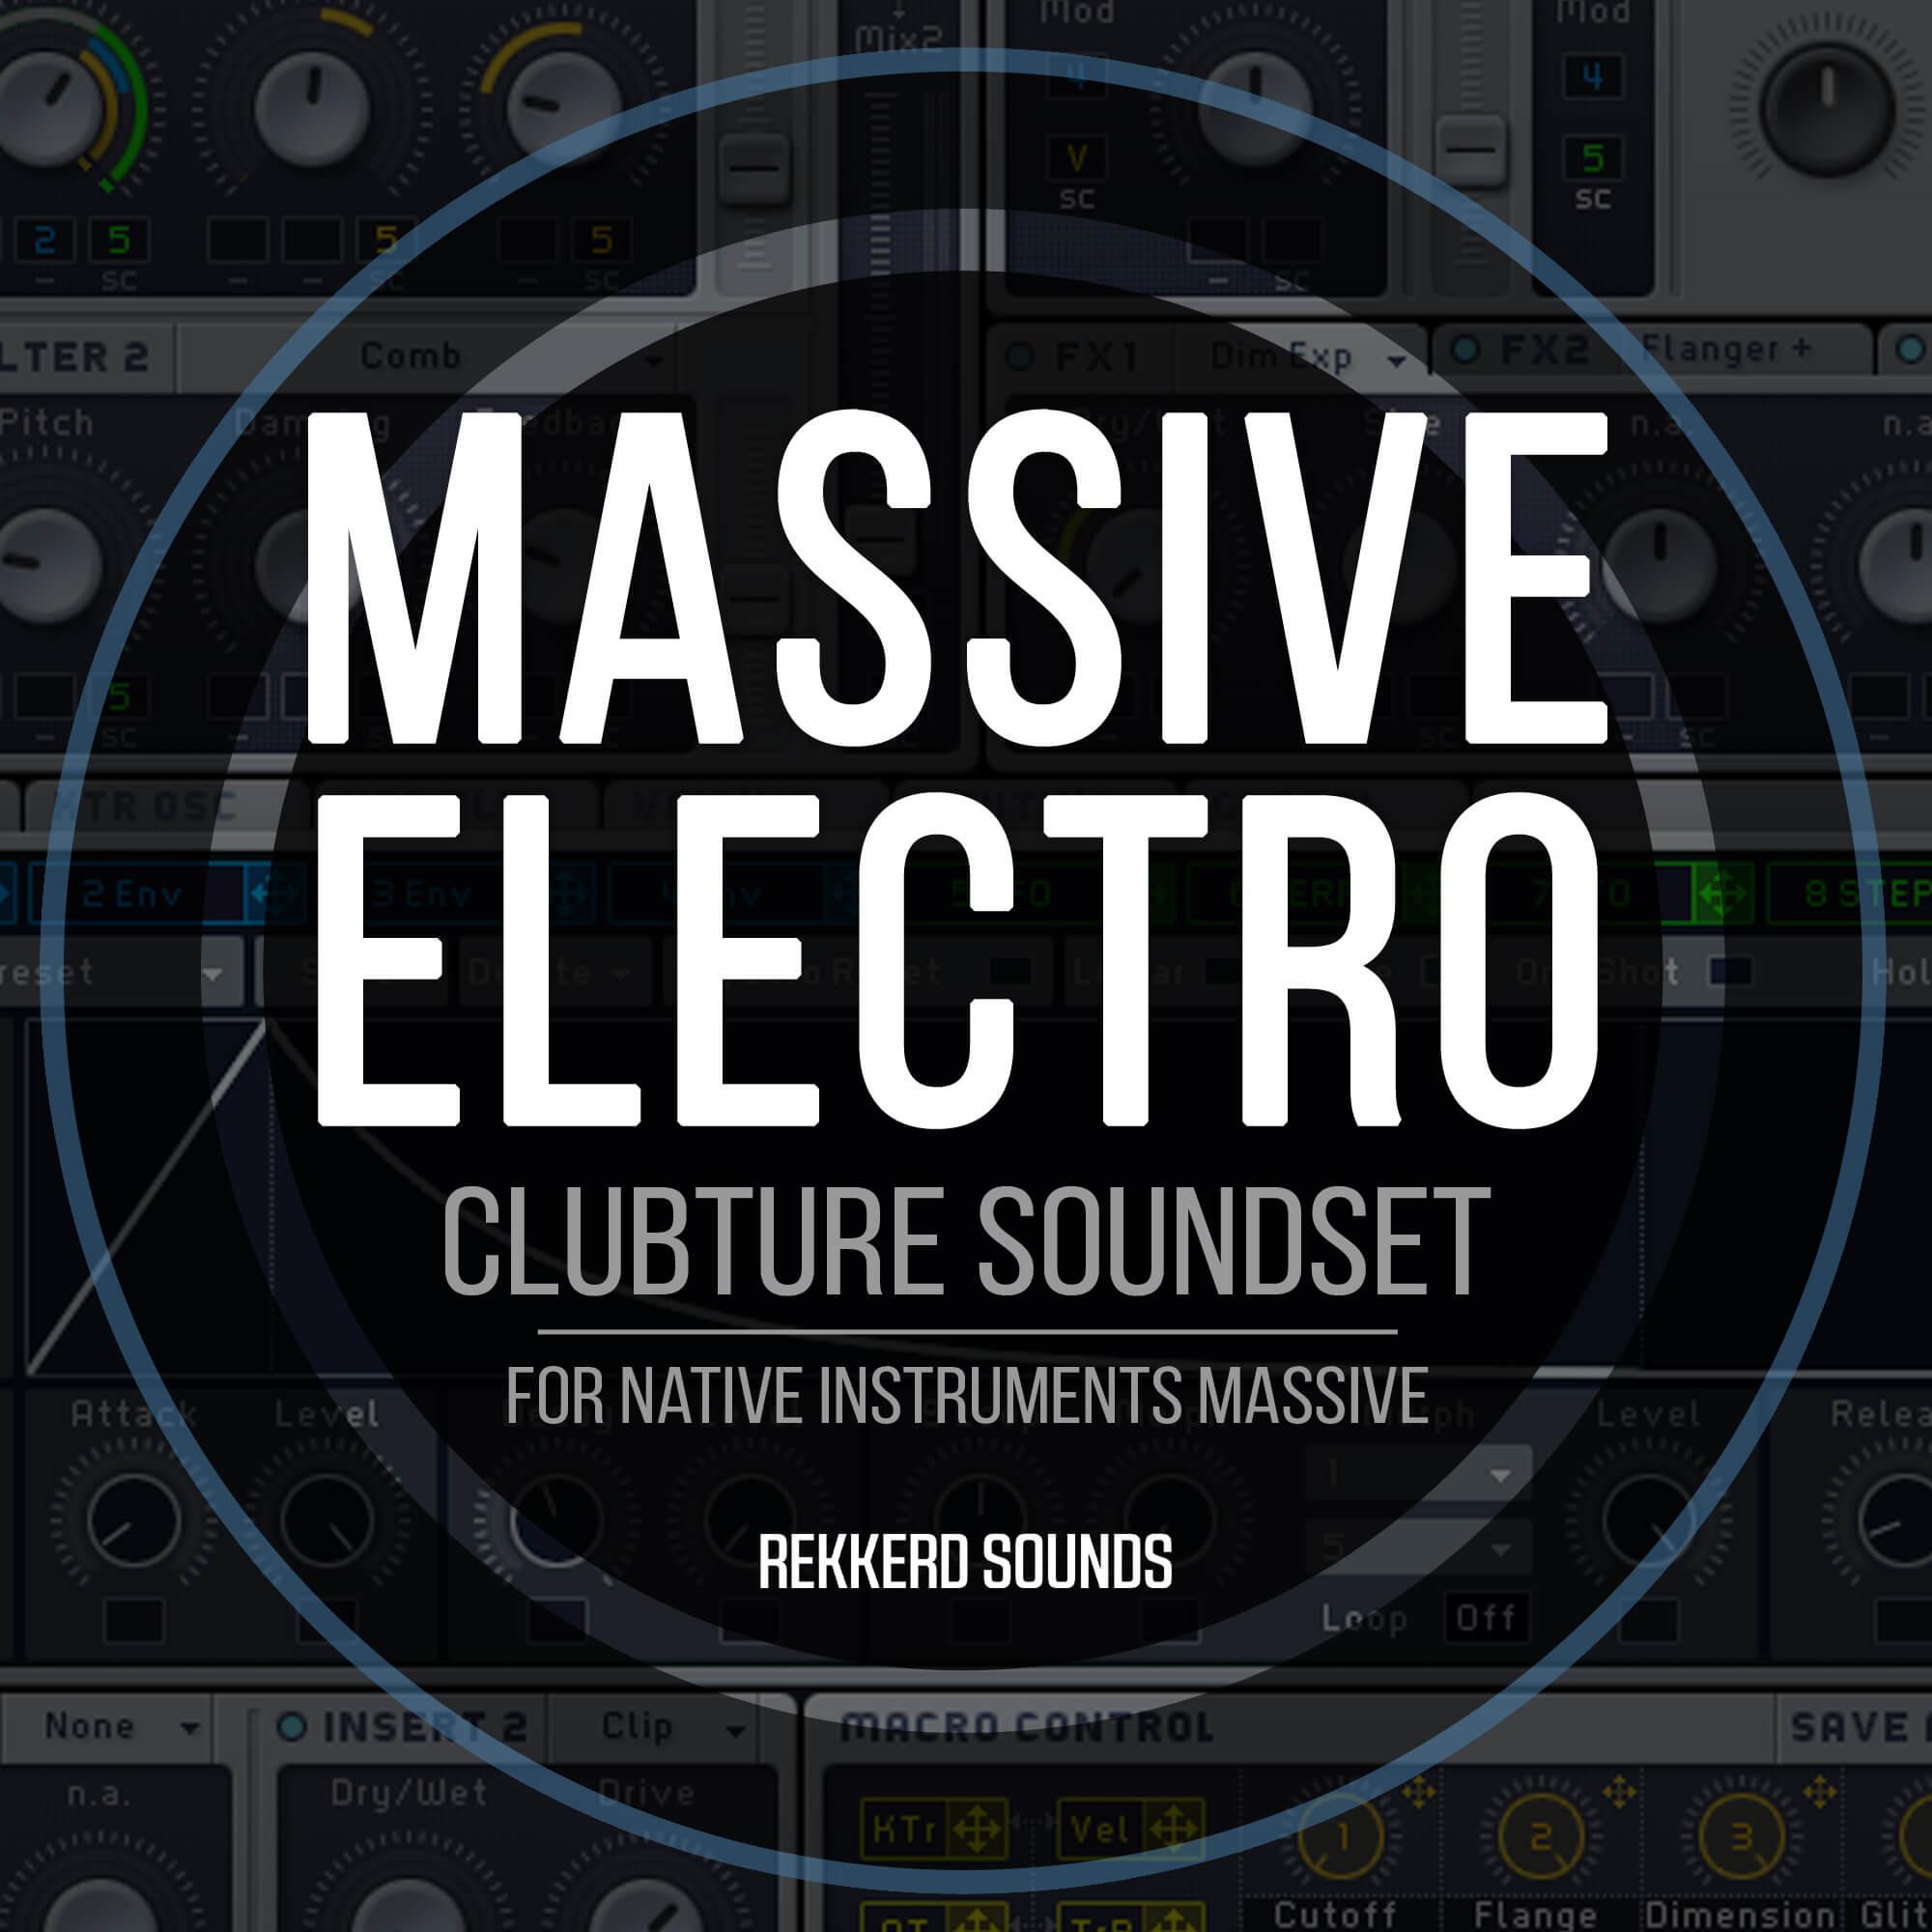 Clubture Soundset - Massive Electro